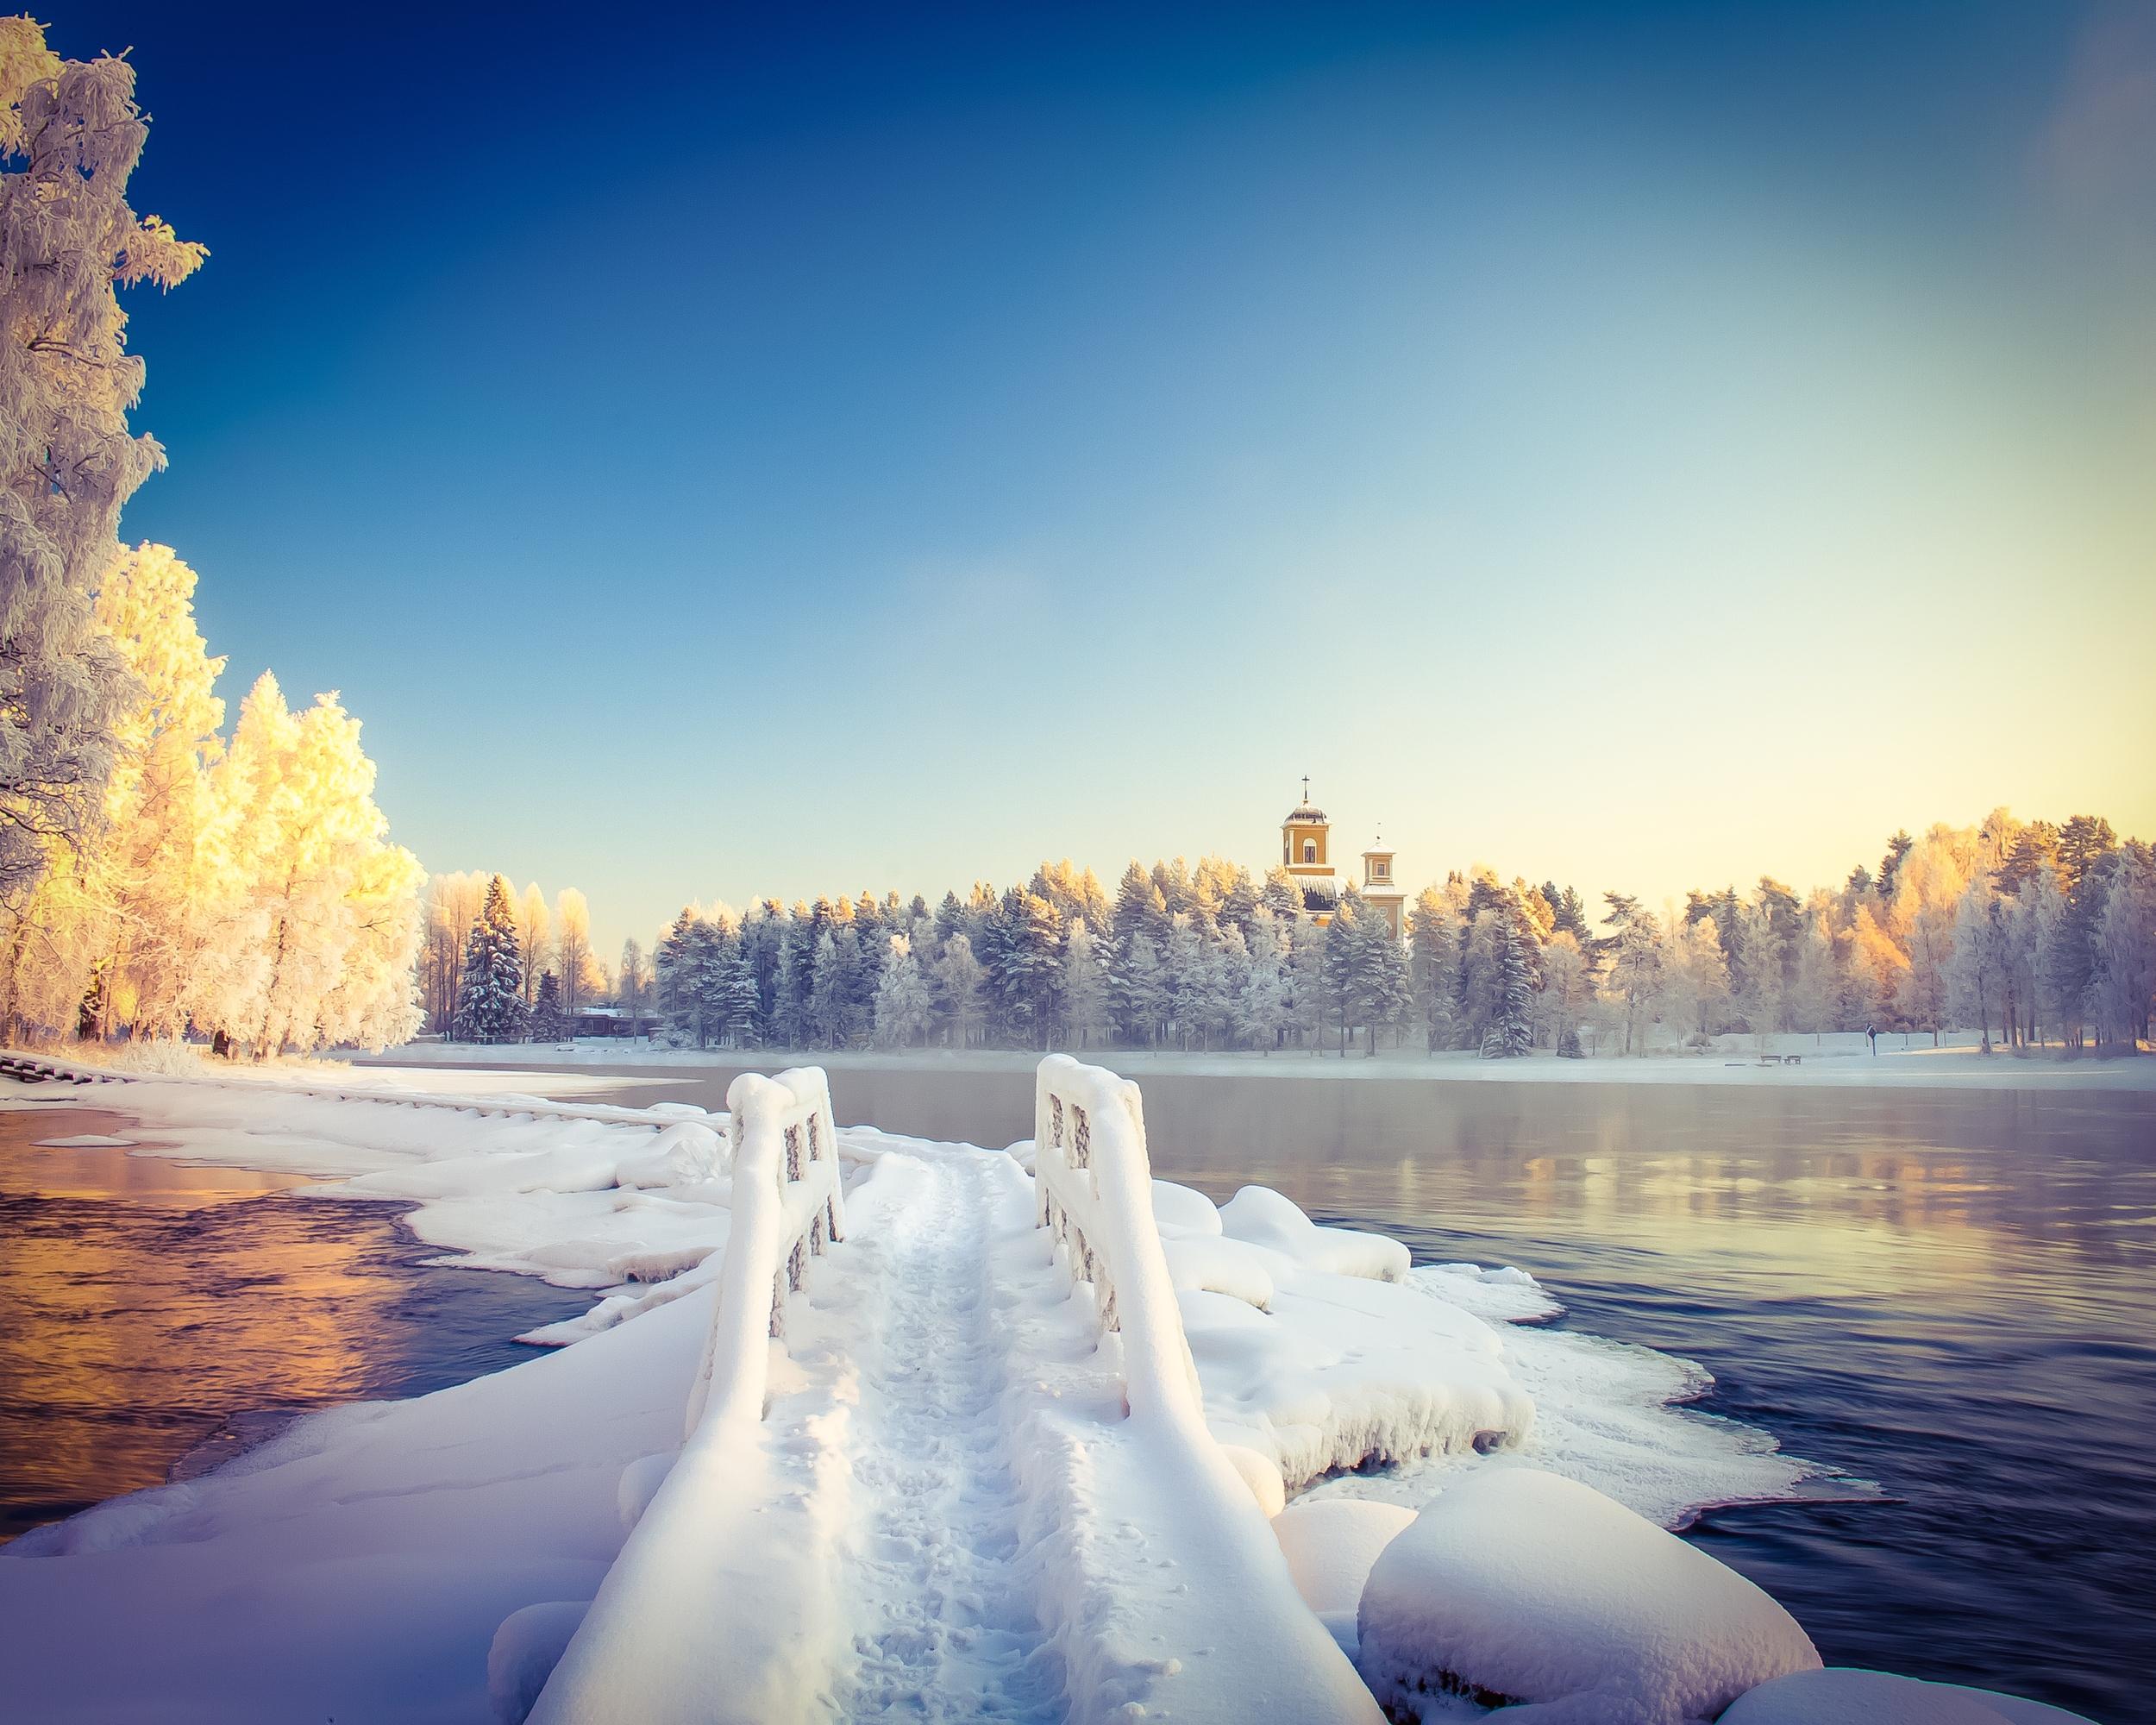 Kuhmo – An Alternative to Lapland